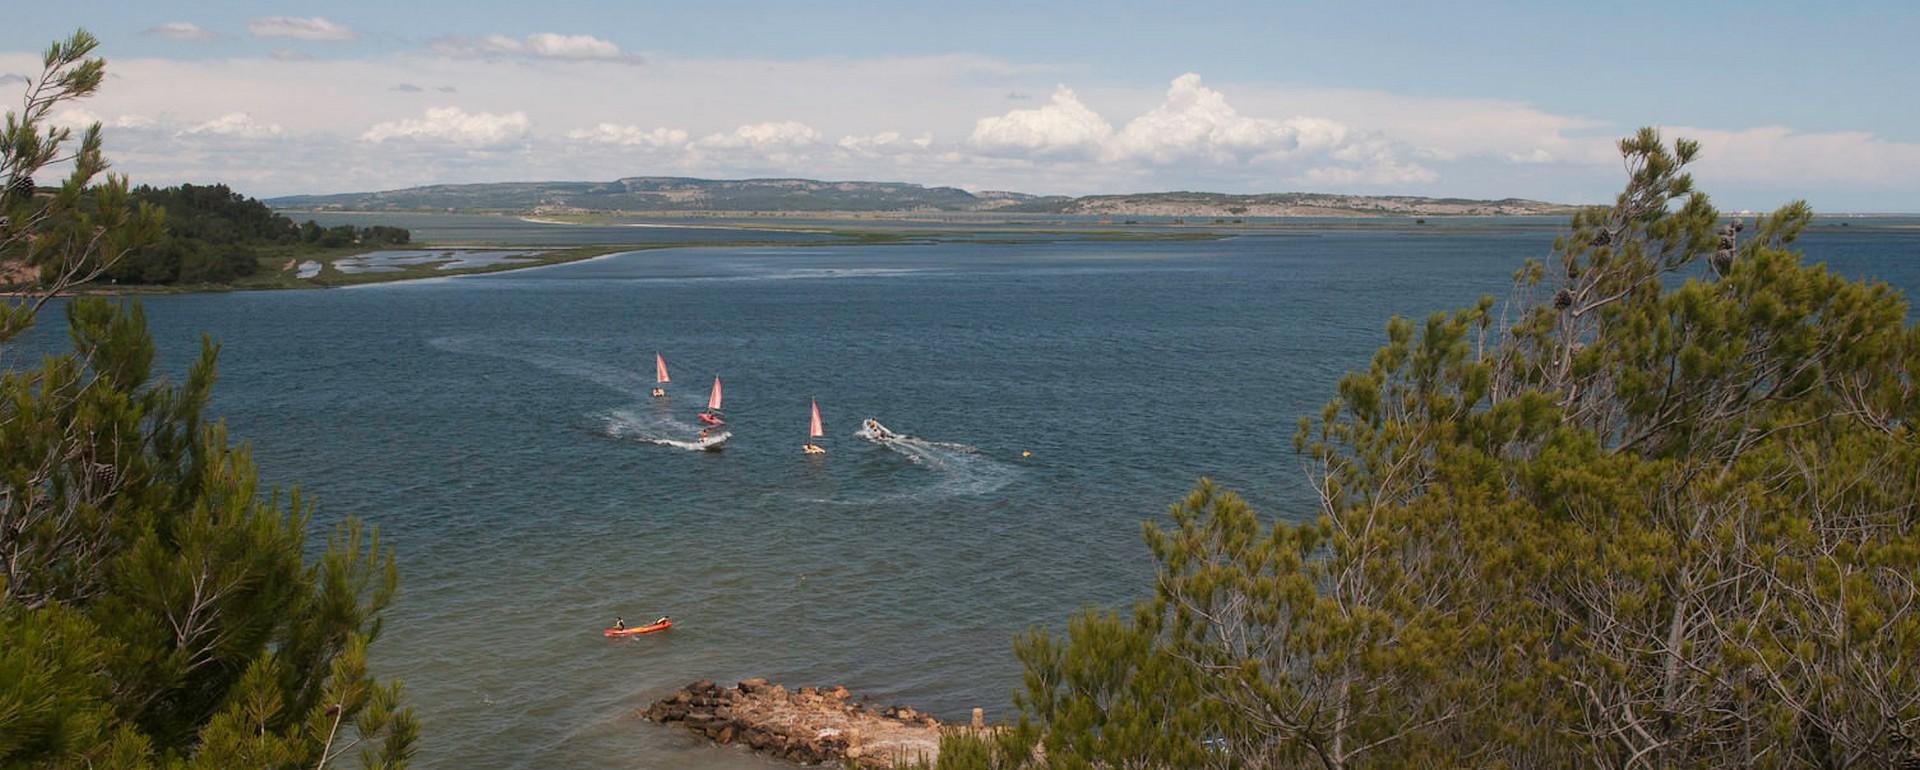 La lagune de Sigean